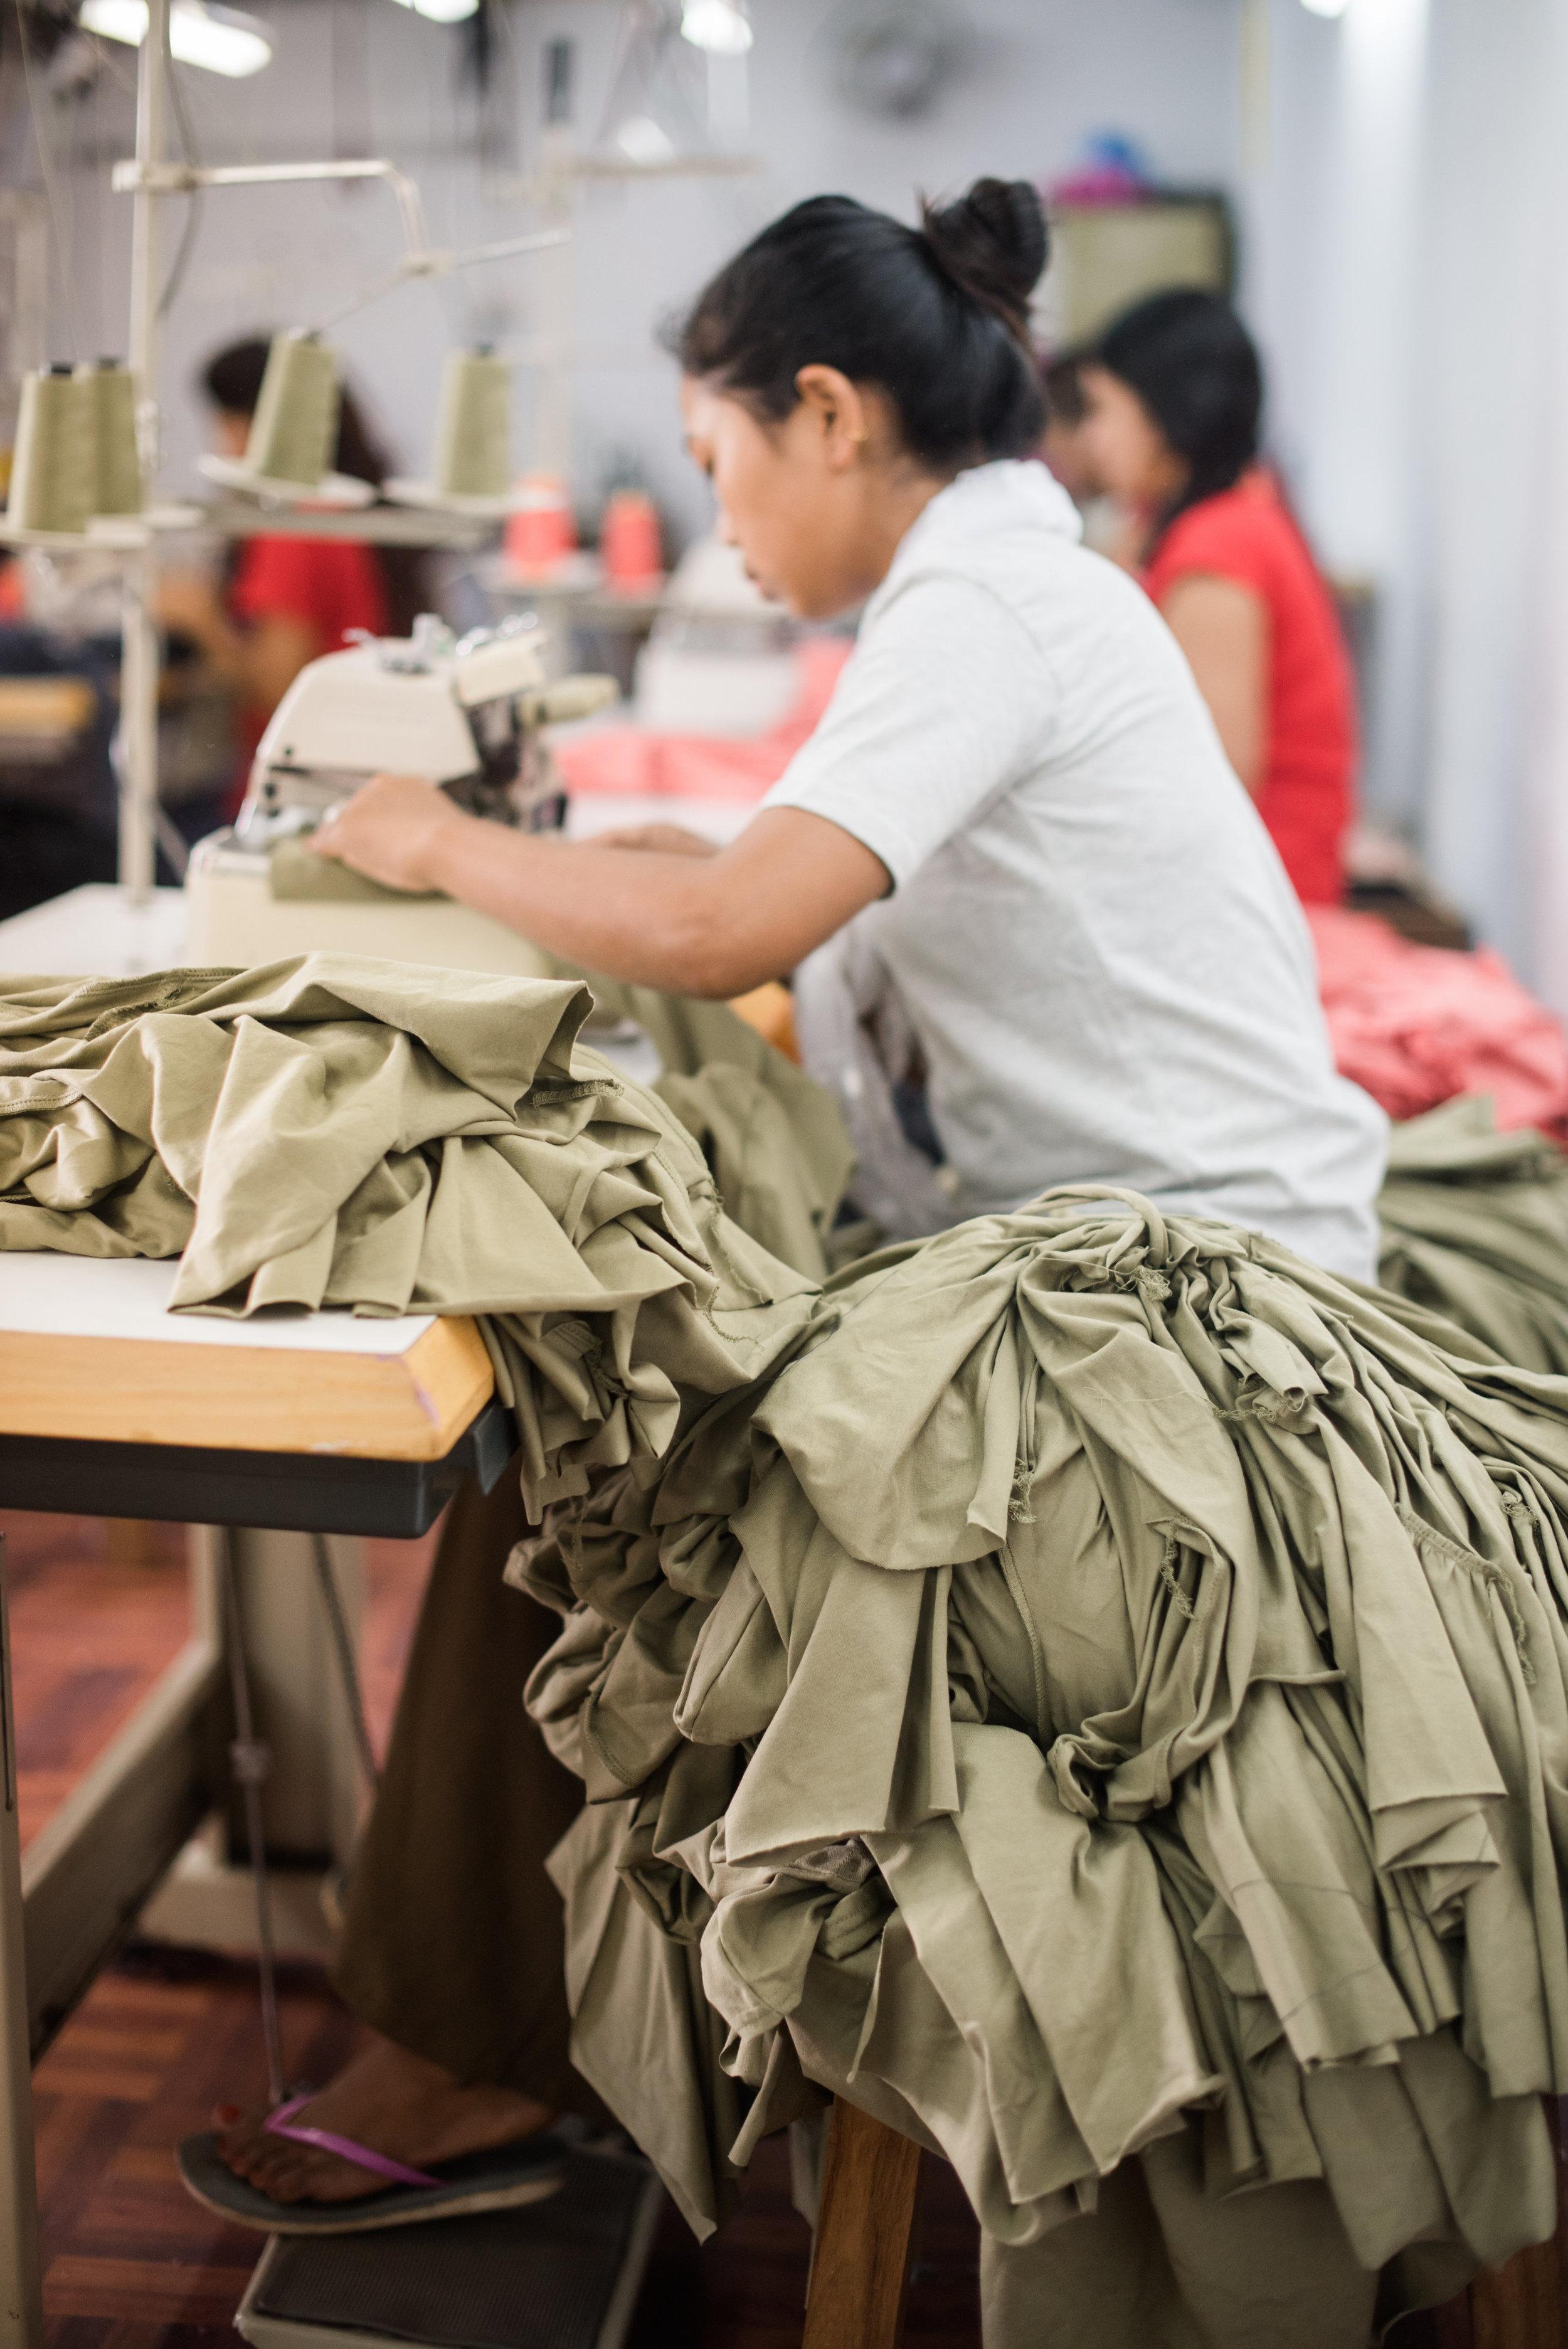 Sewing Center - Kyra Rane Photography (7).jpg